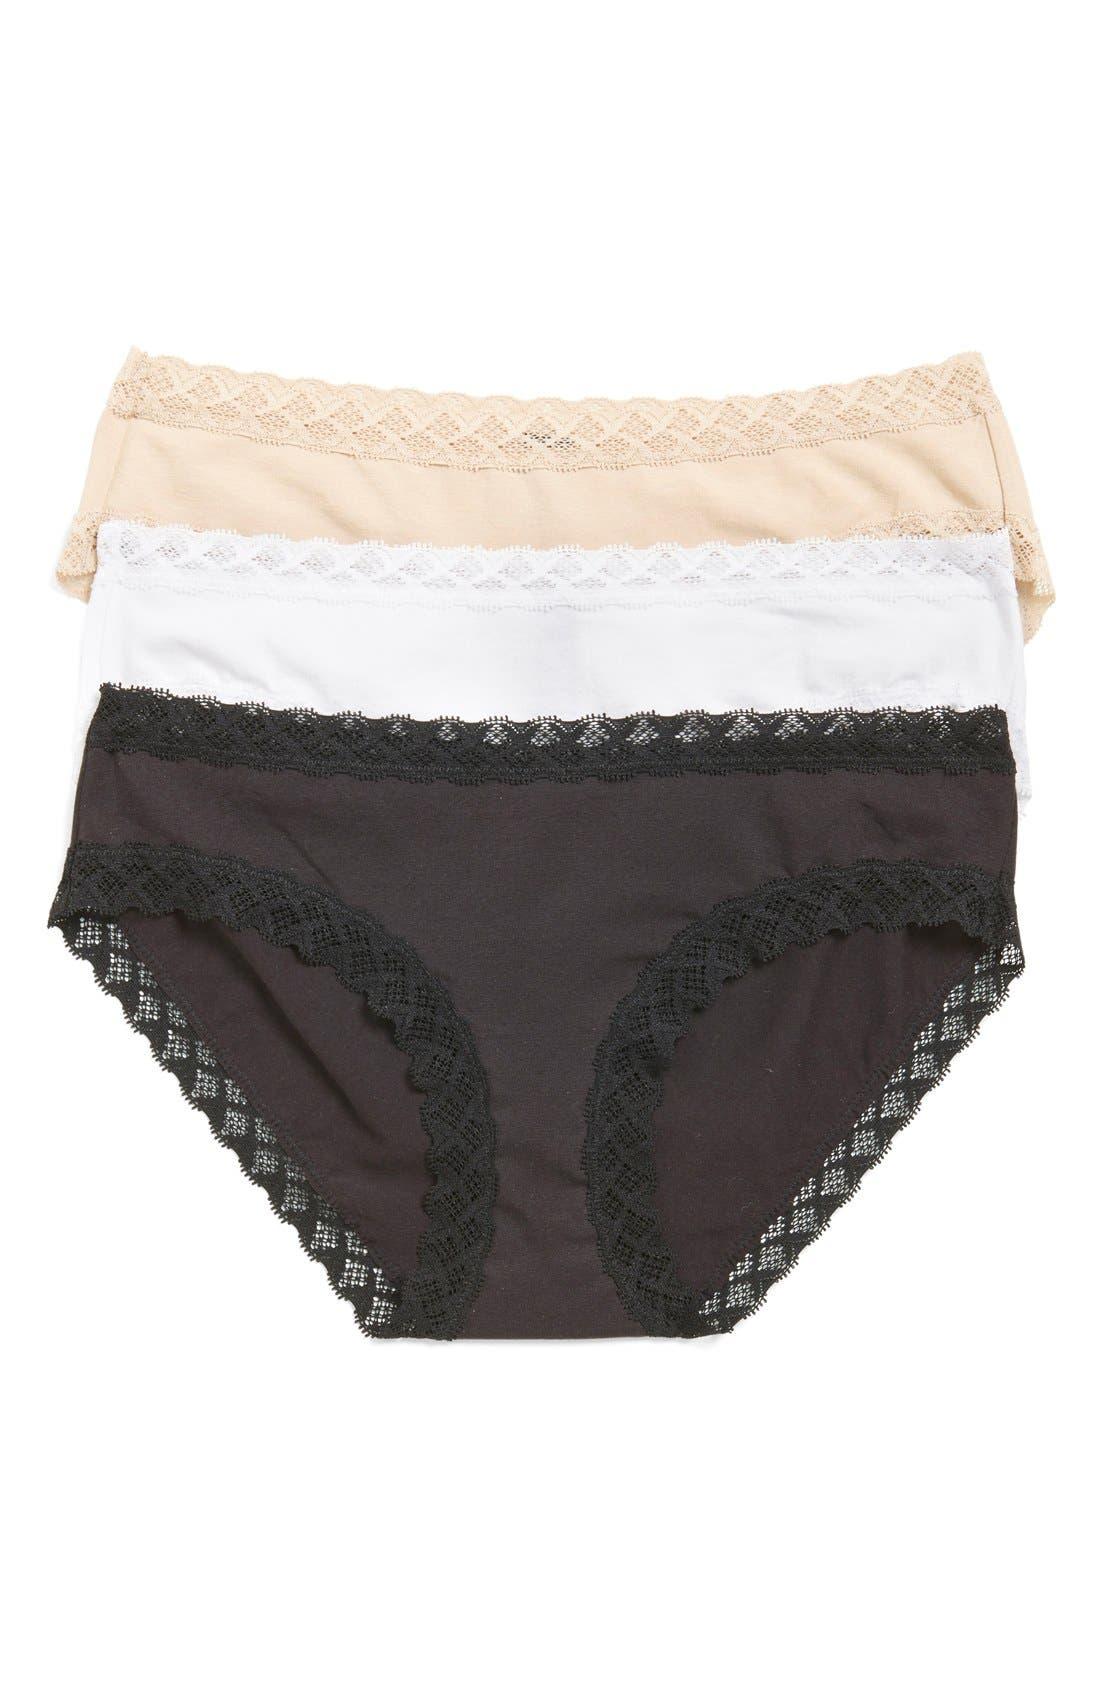 Panties Shapewear amp; Lingerie Nordstrom Hosiery Women's gwZdqIg